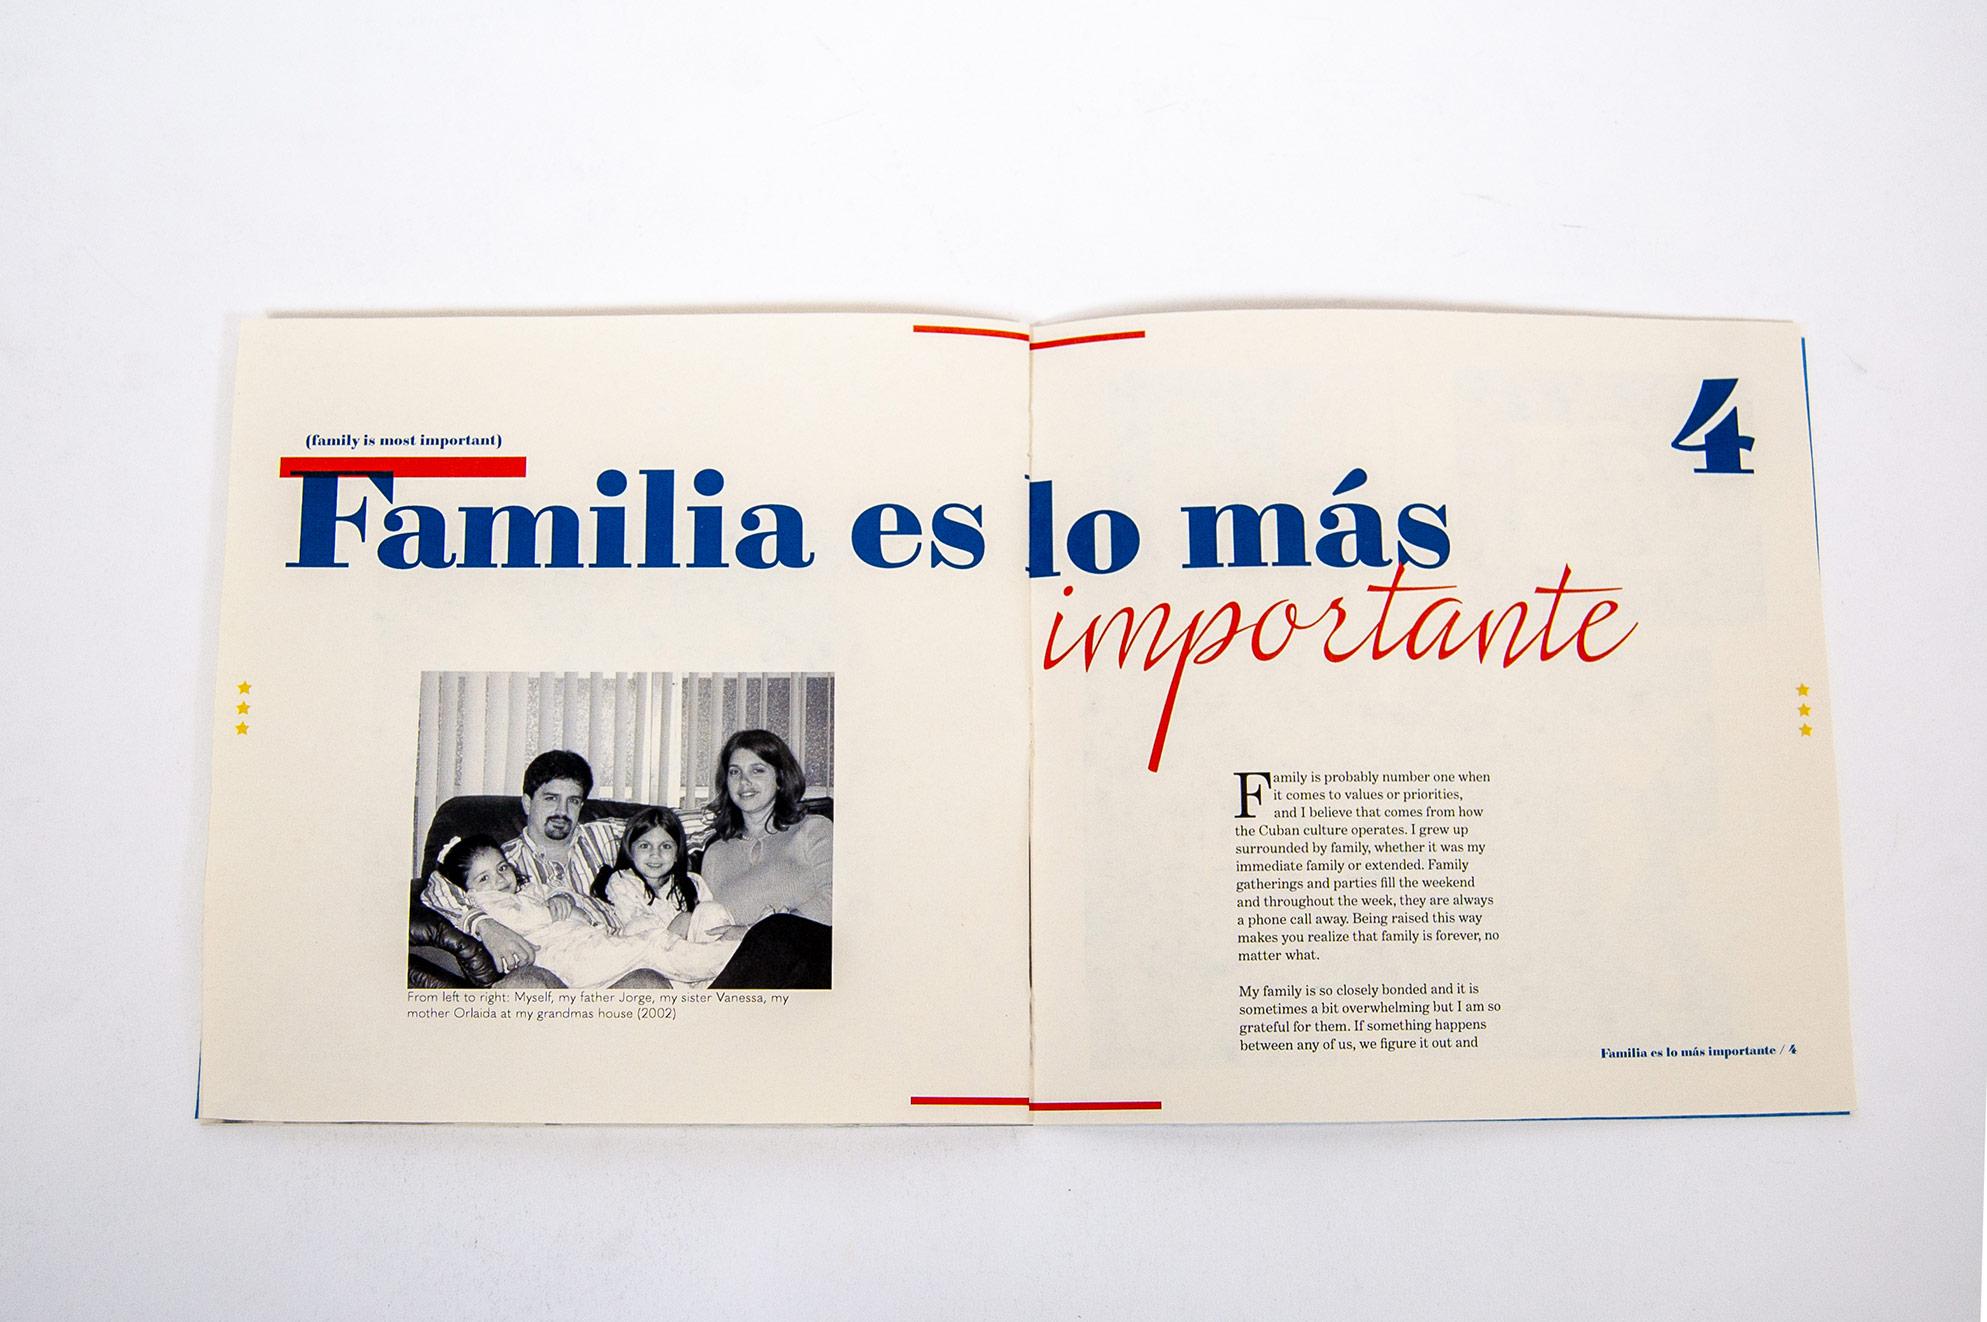 Senior_Martinez_La-Cubanita-Arrepentida_04-Jessica-Martinez